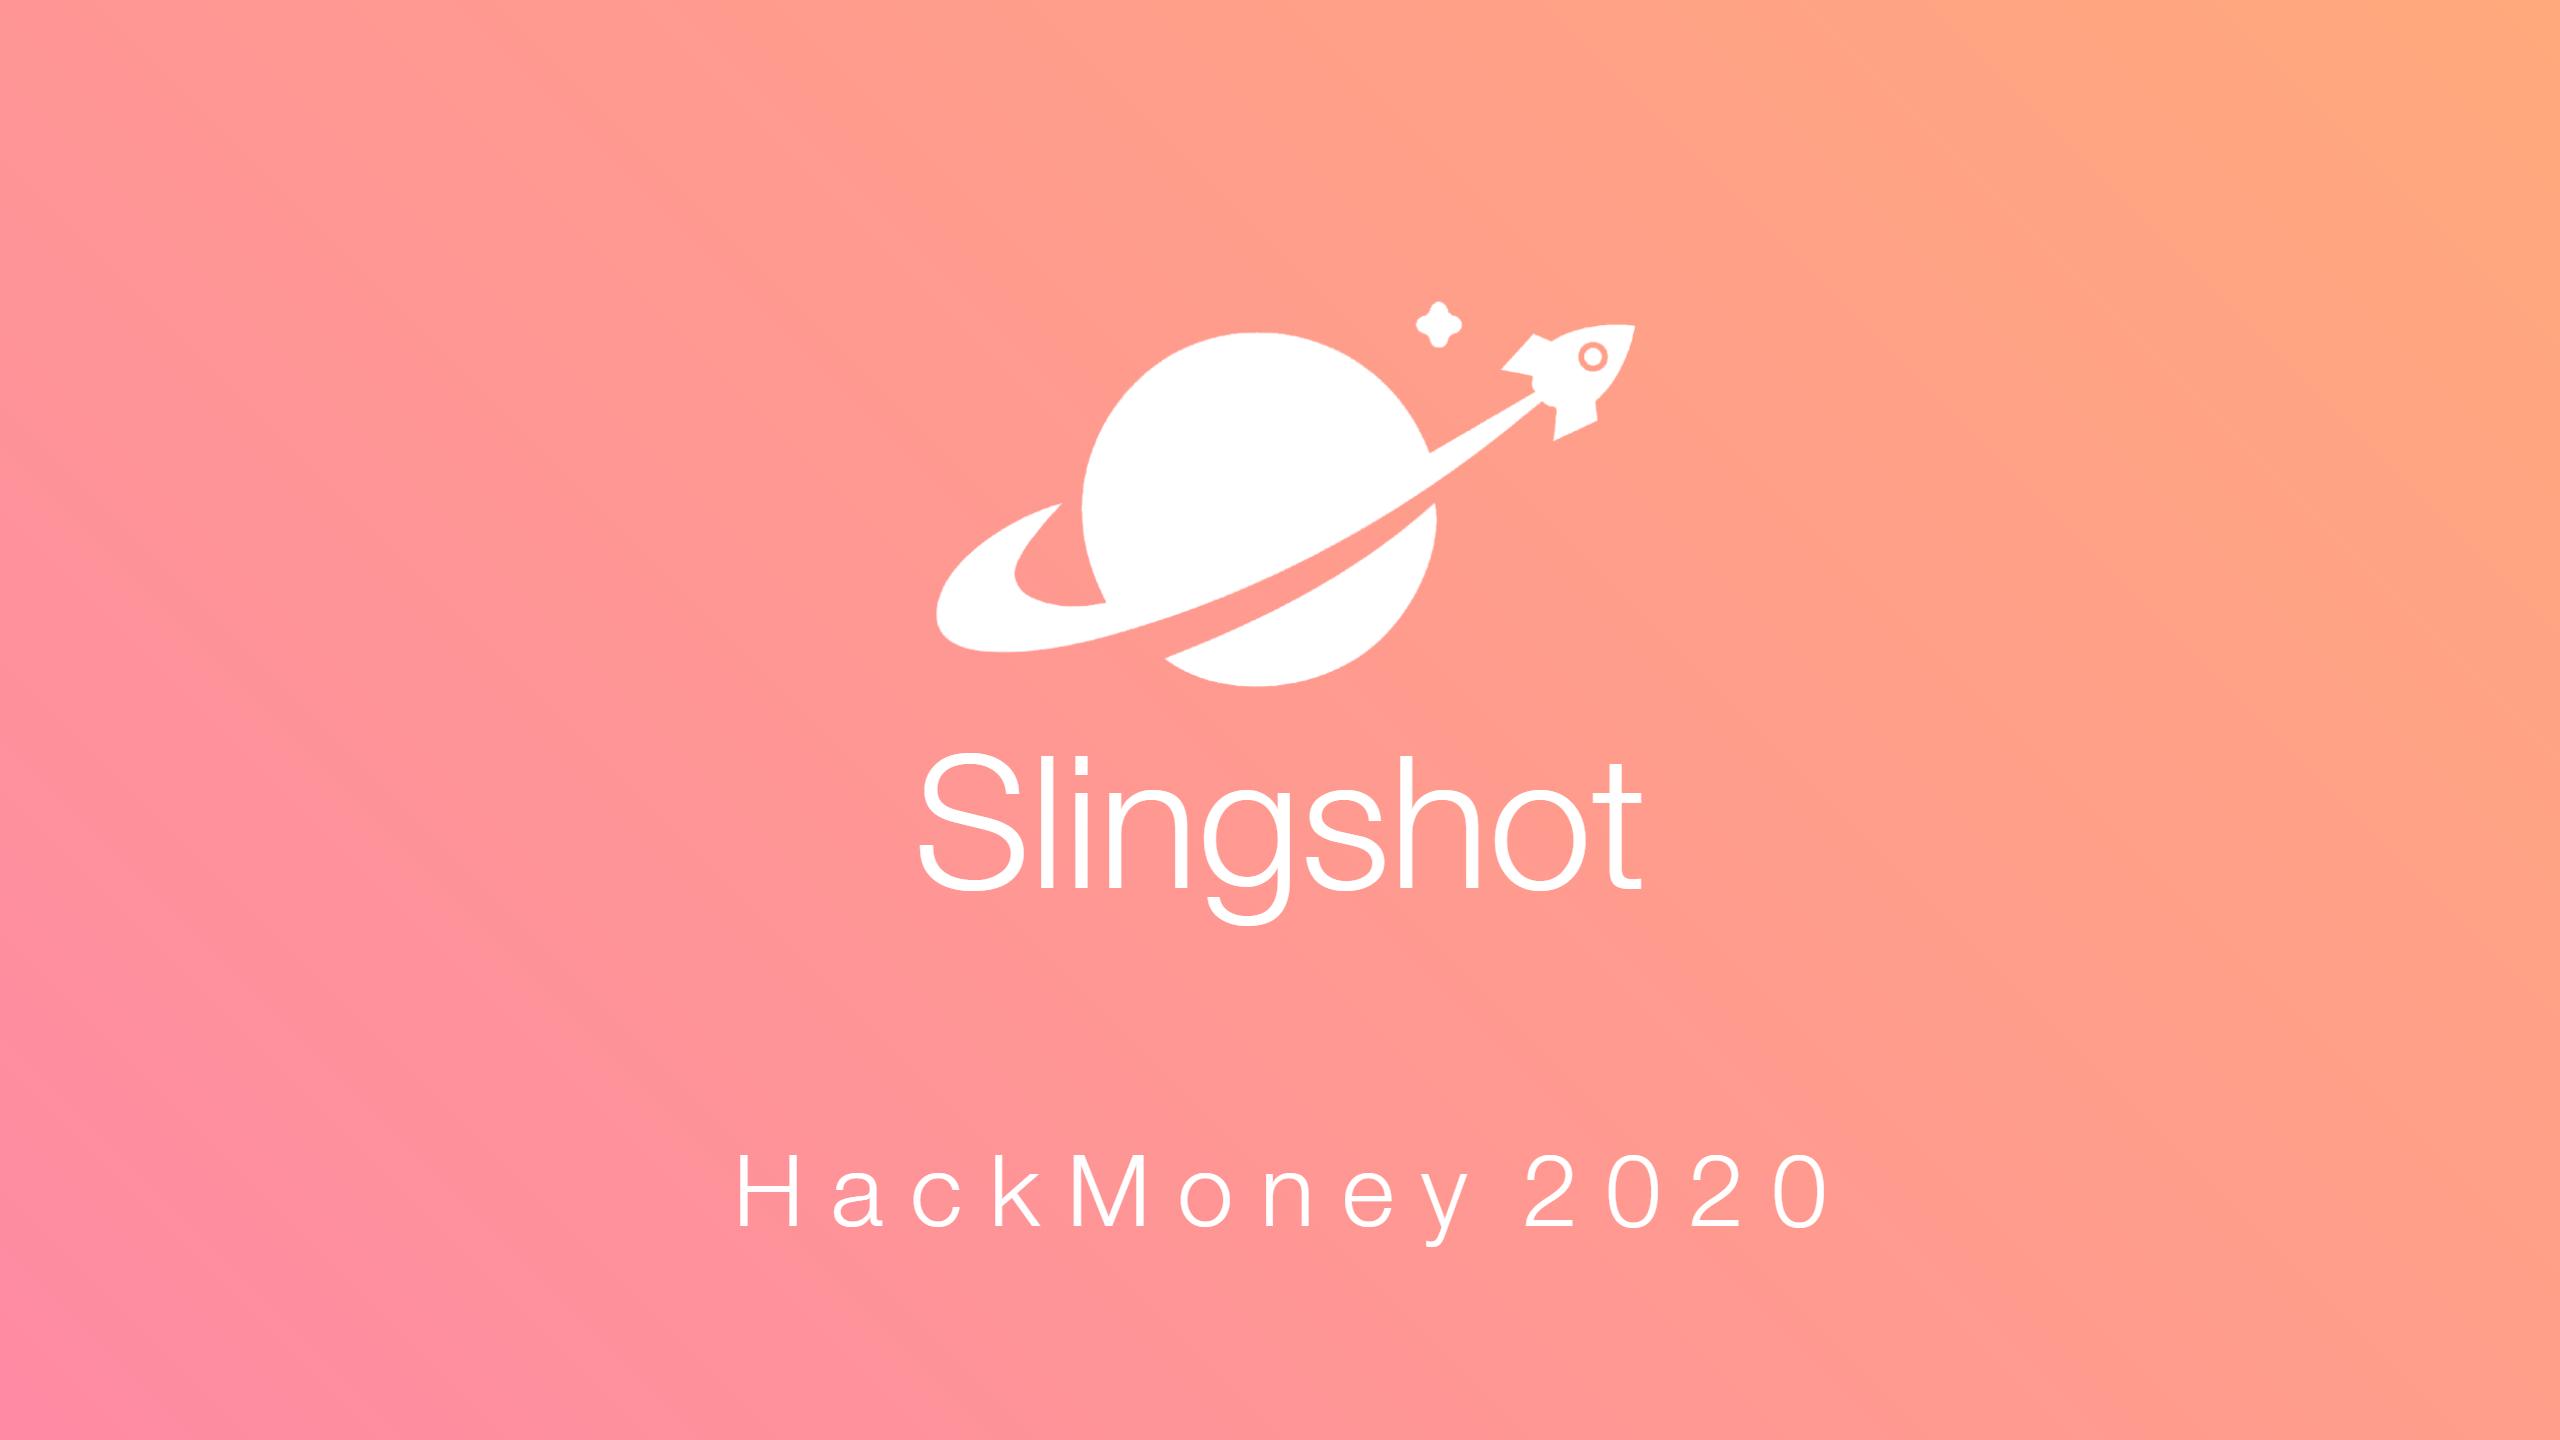 Slingshot showcase